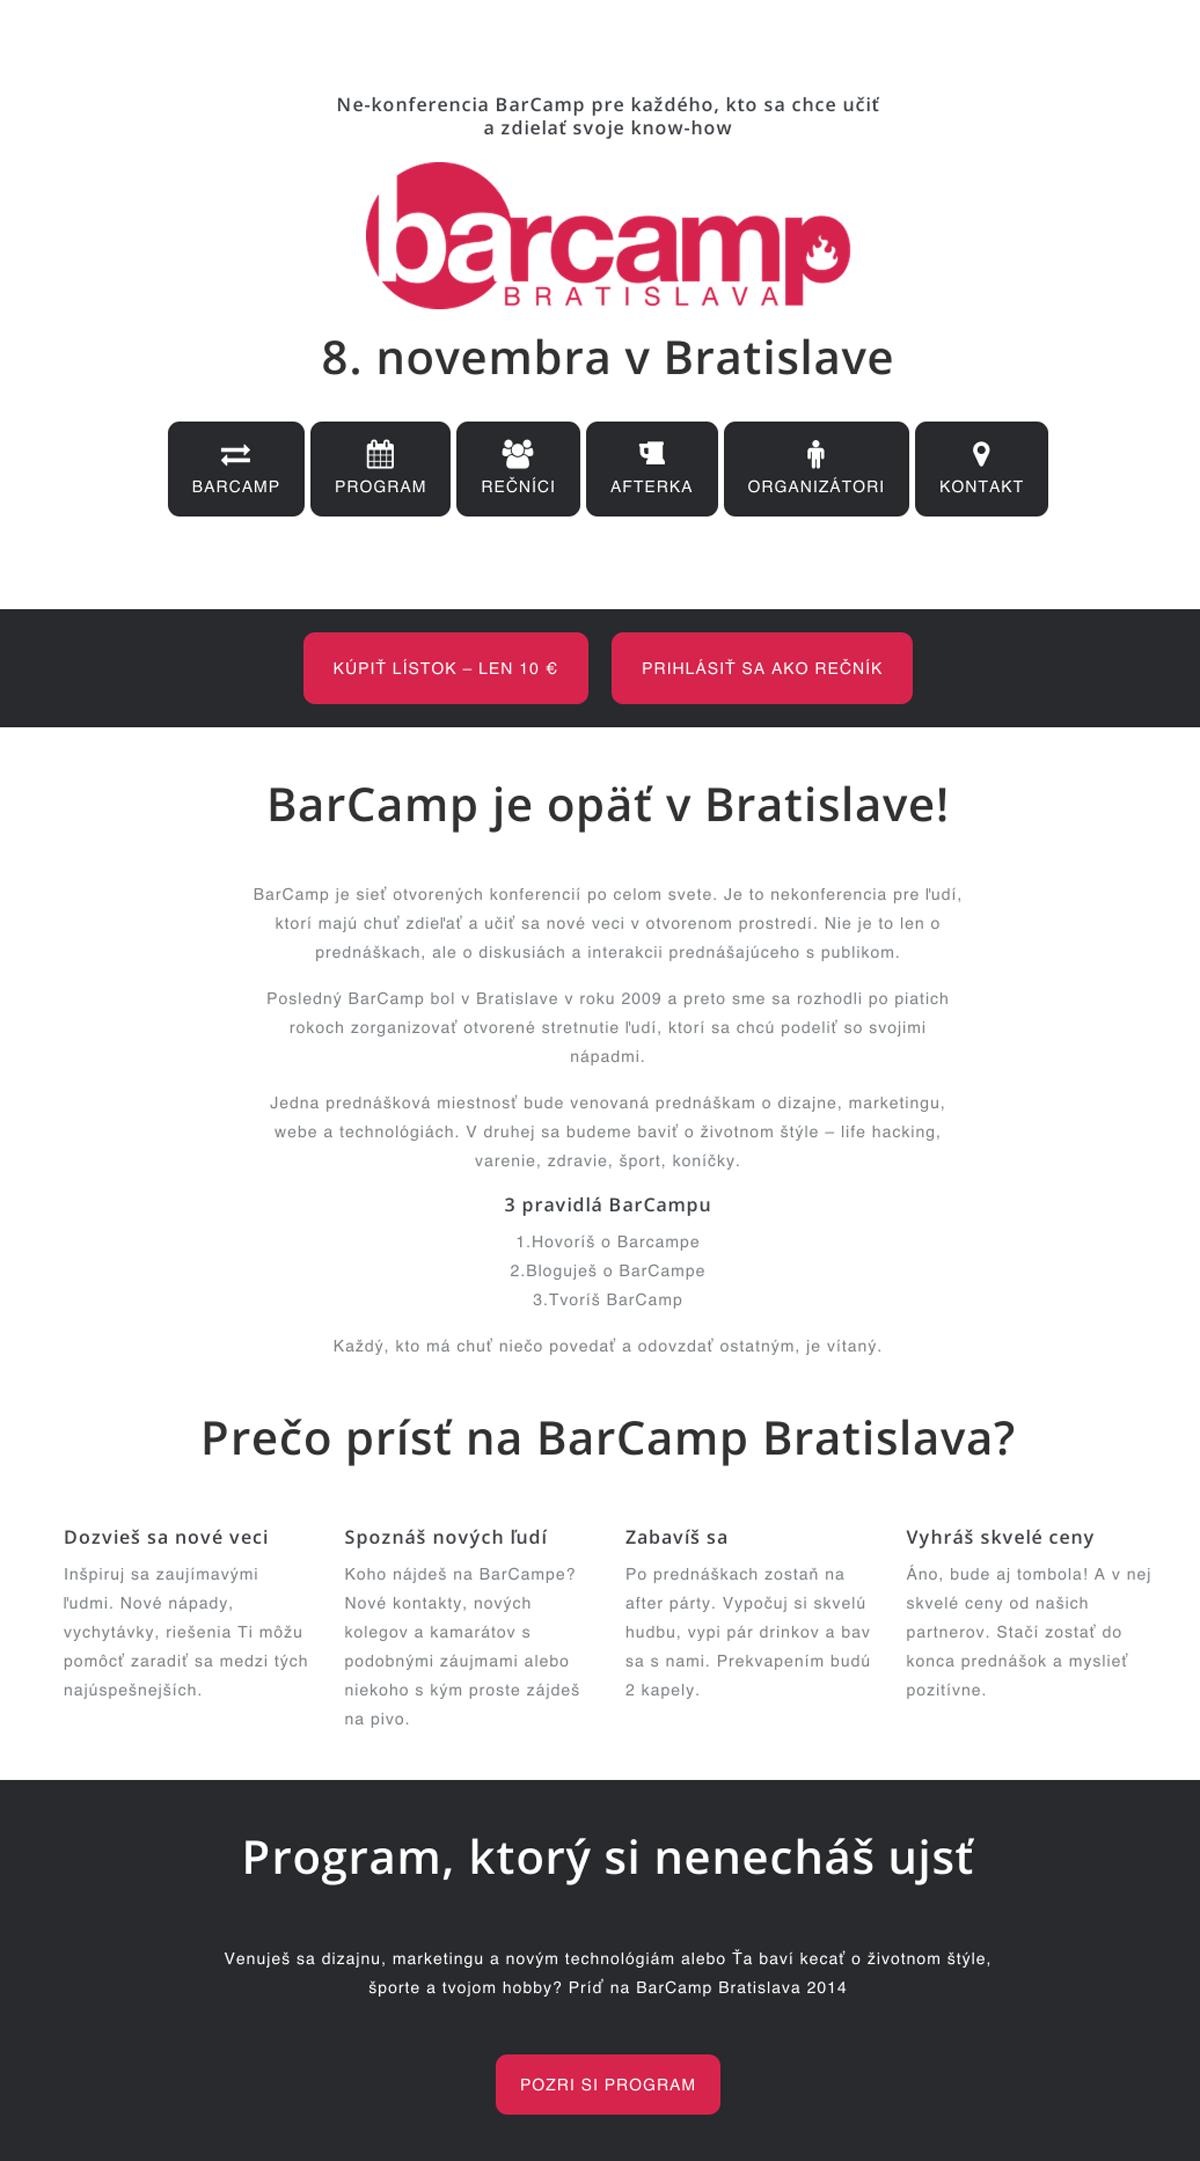 Barcamp-Bratislava-2014_1